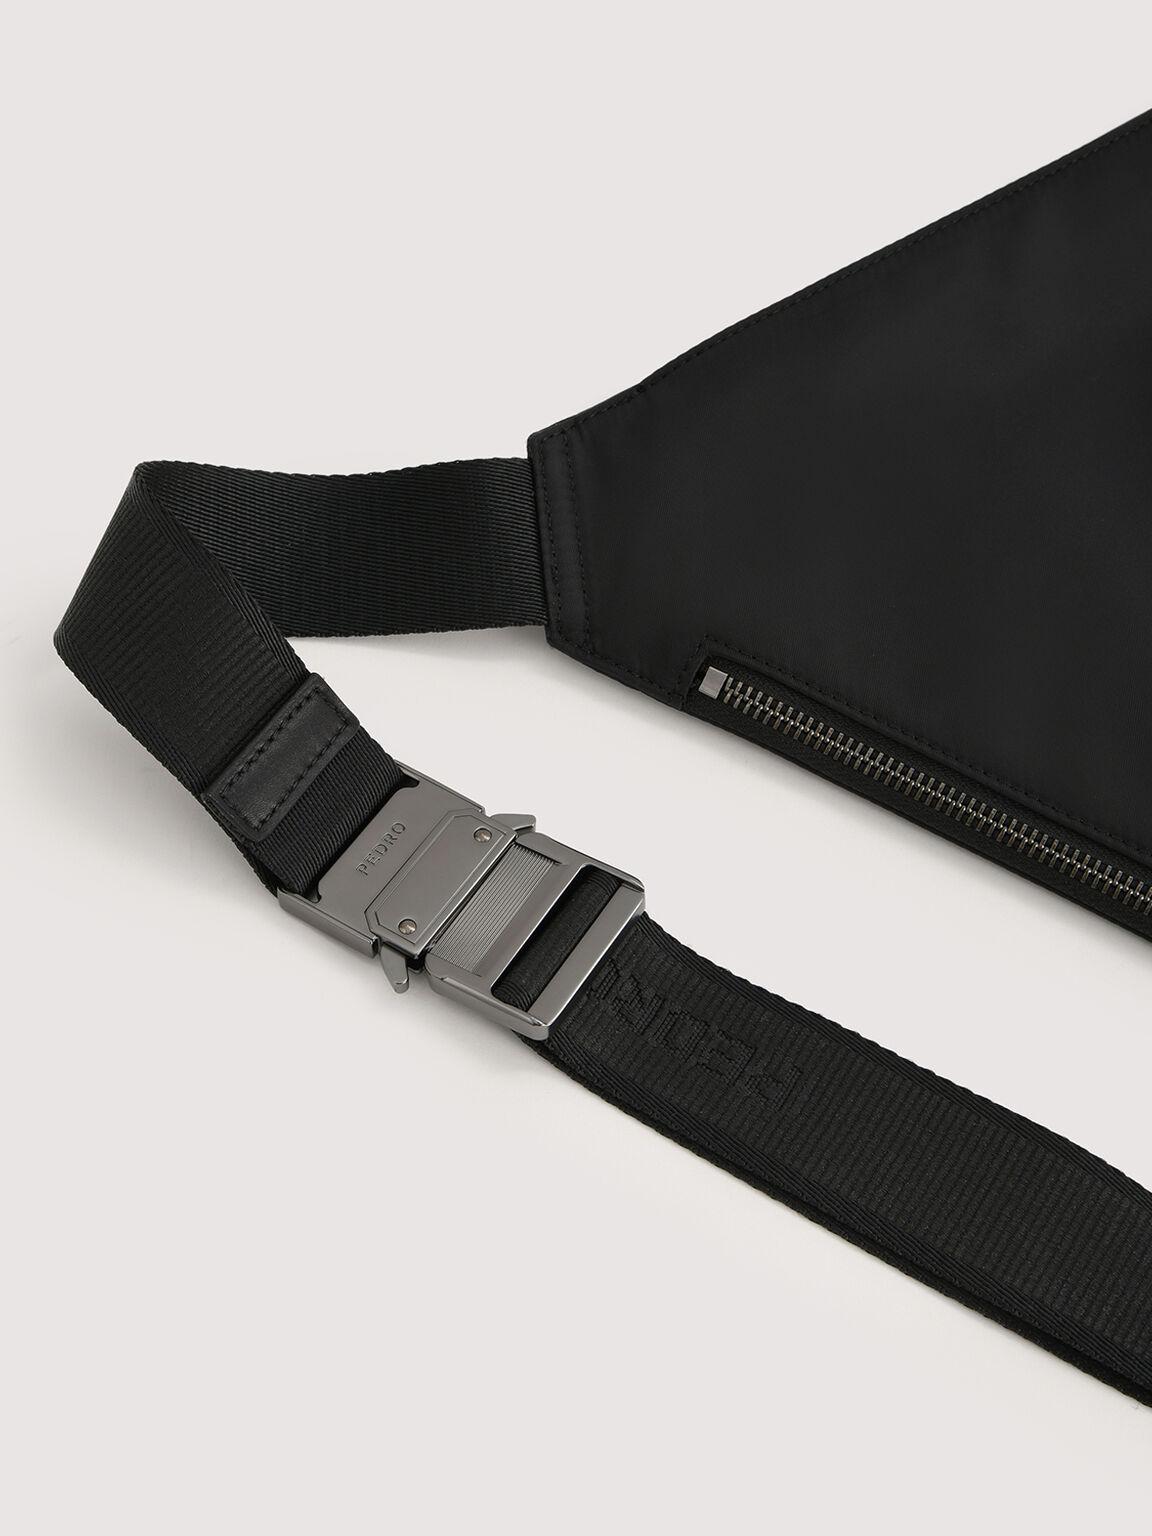 Nylon Sling Pouch, Black, hi-res